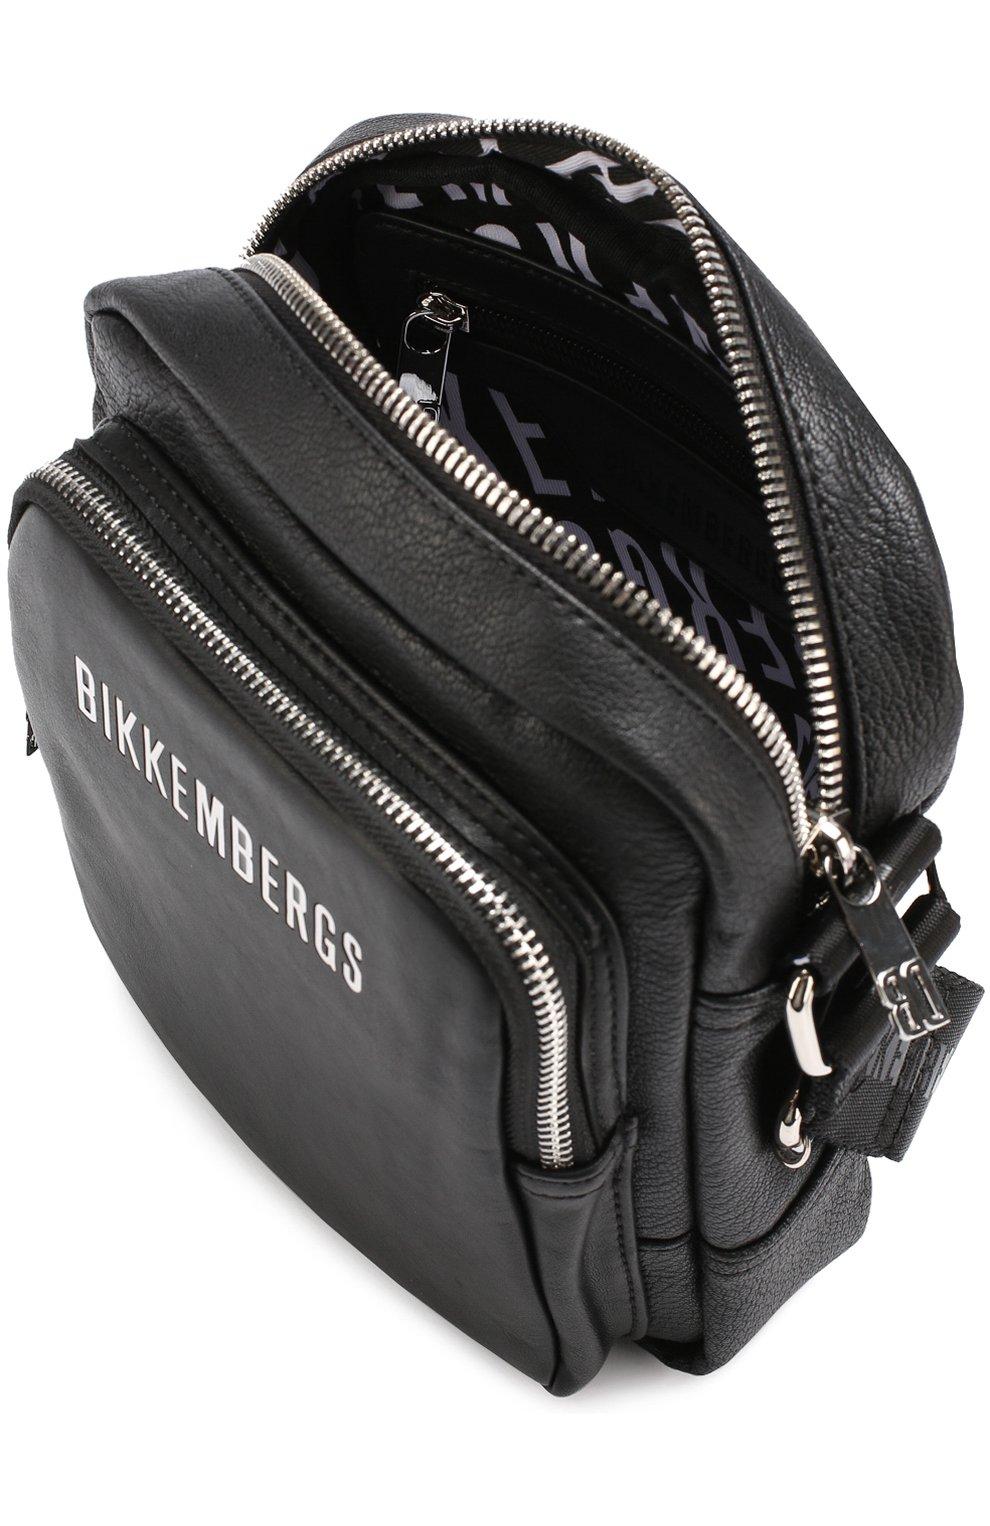 c7d517004203 Сумка-планшет с внешним карманом на молнии Dirk Bikkembergs черная   Фото №4